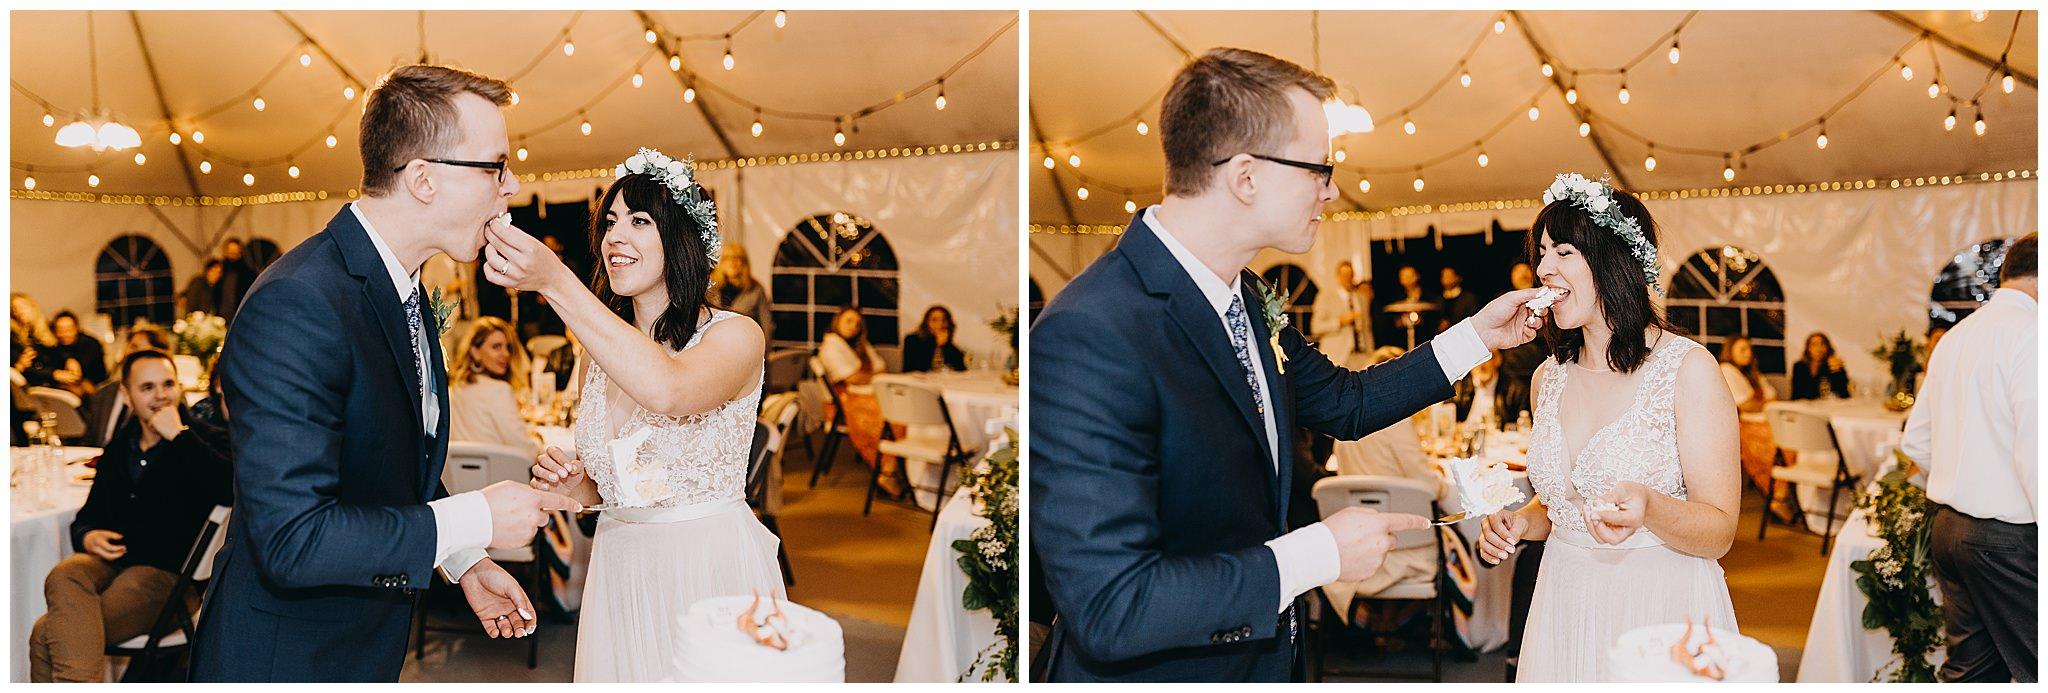 wallace-falls-lodge-wedding-evan-kelsey99.jpg